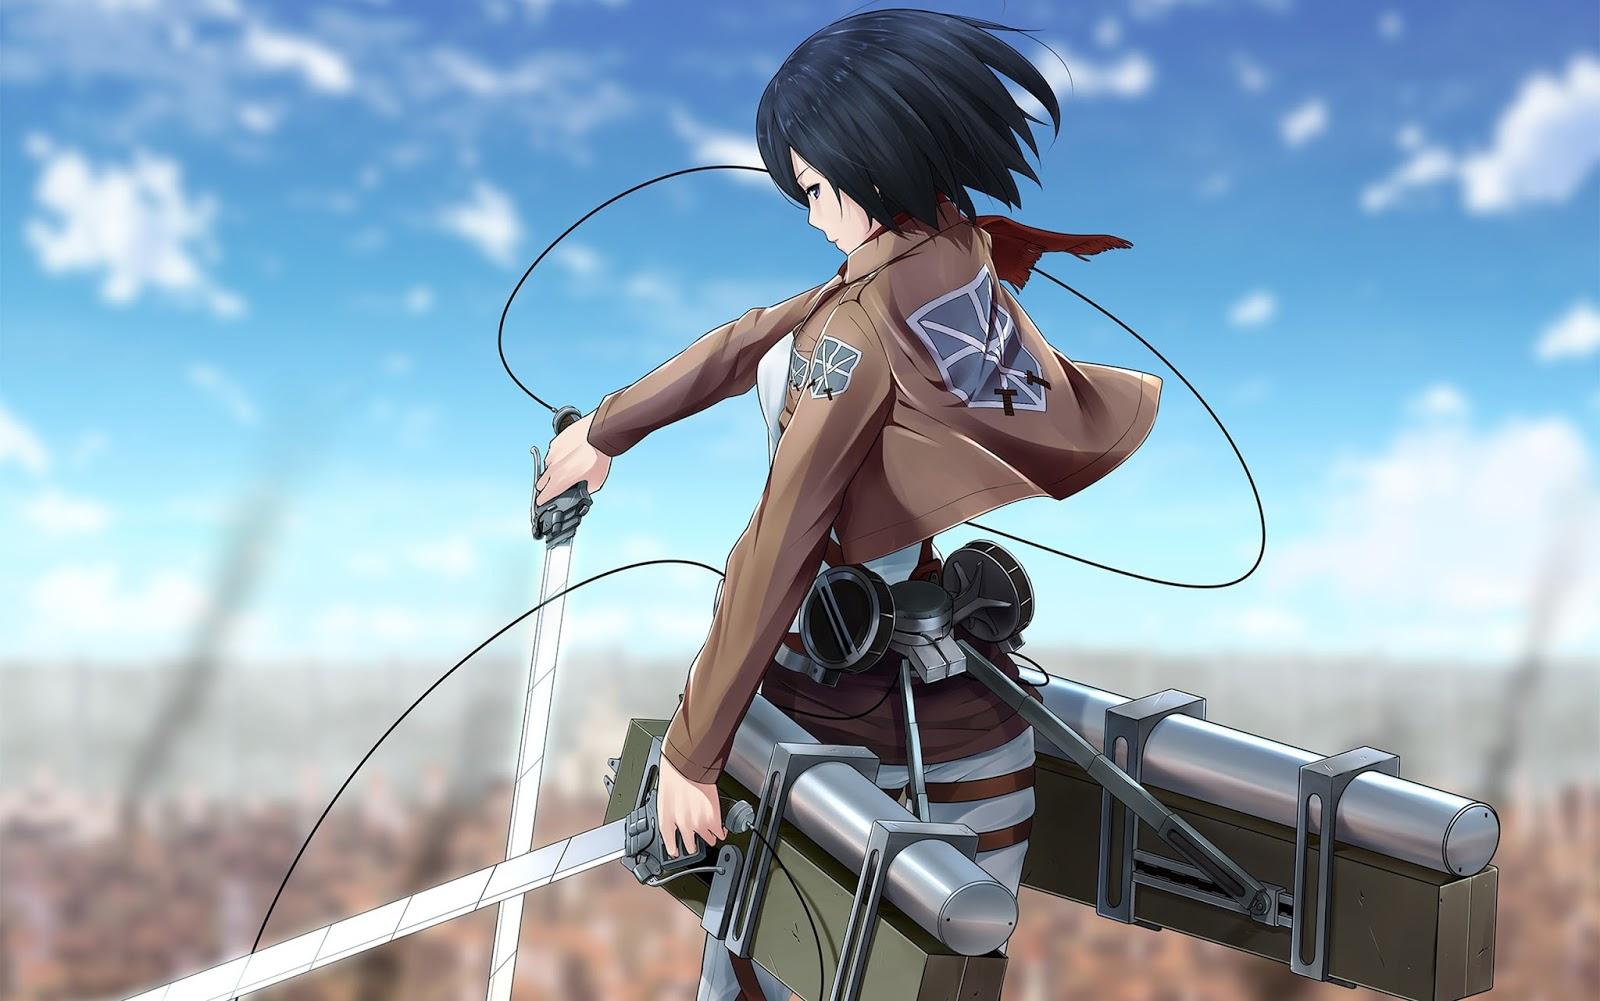 Kyojin Anime Girl Weapon 3D Maneuver Gear HD Wallpaper Backgrounds f6 1600x1001